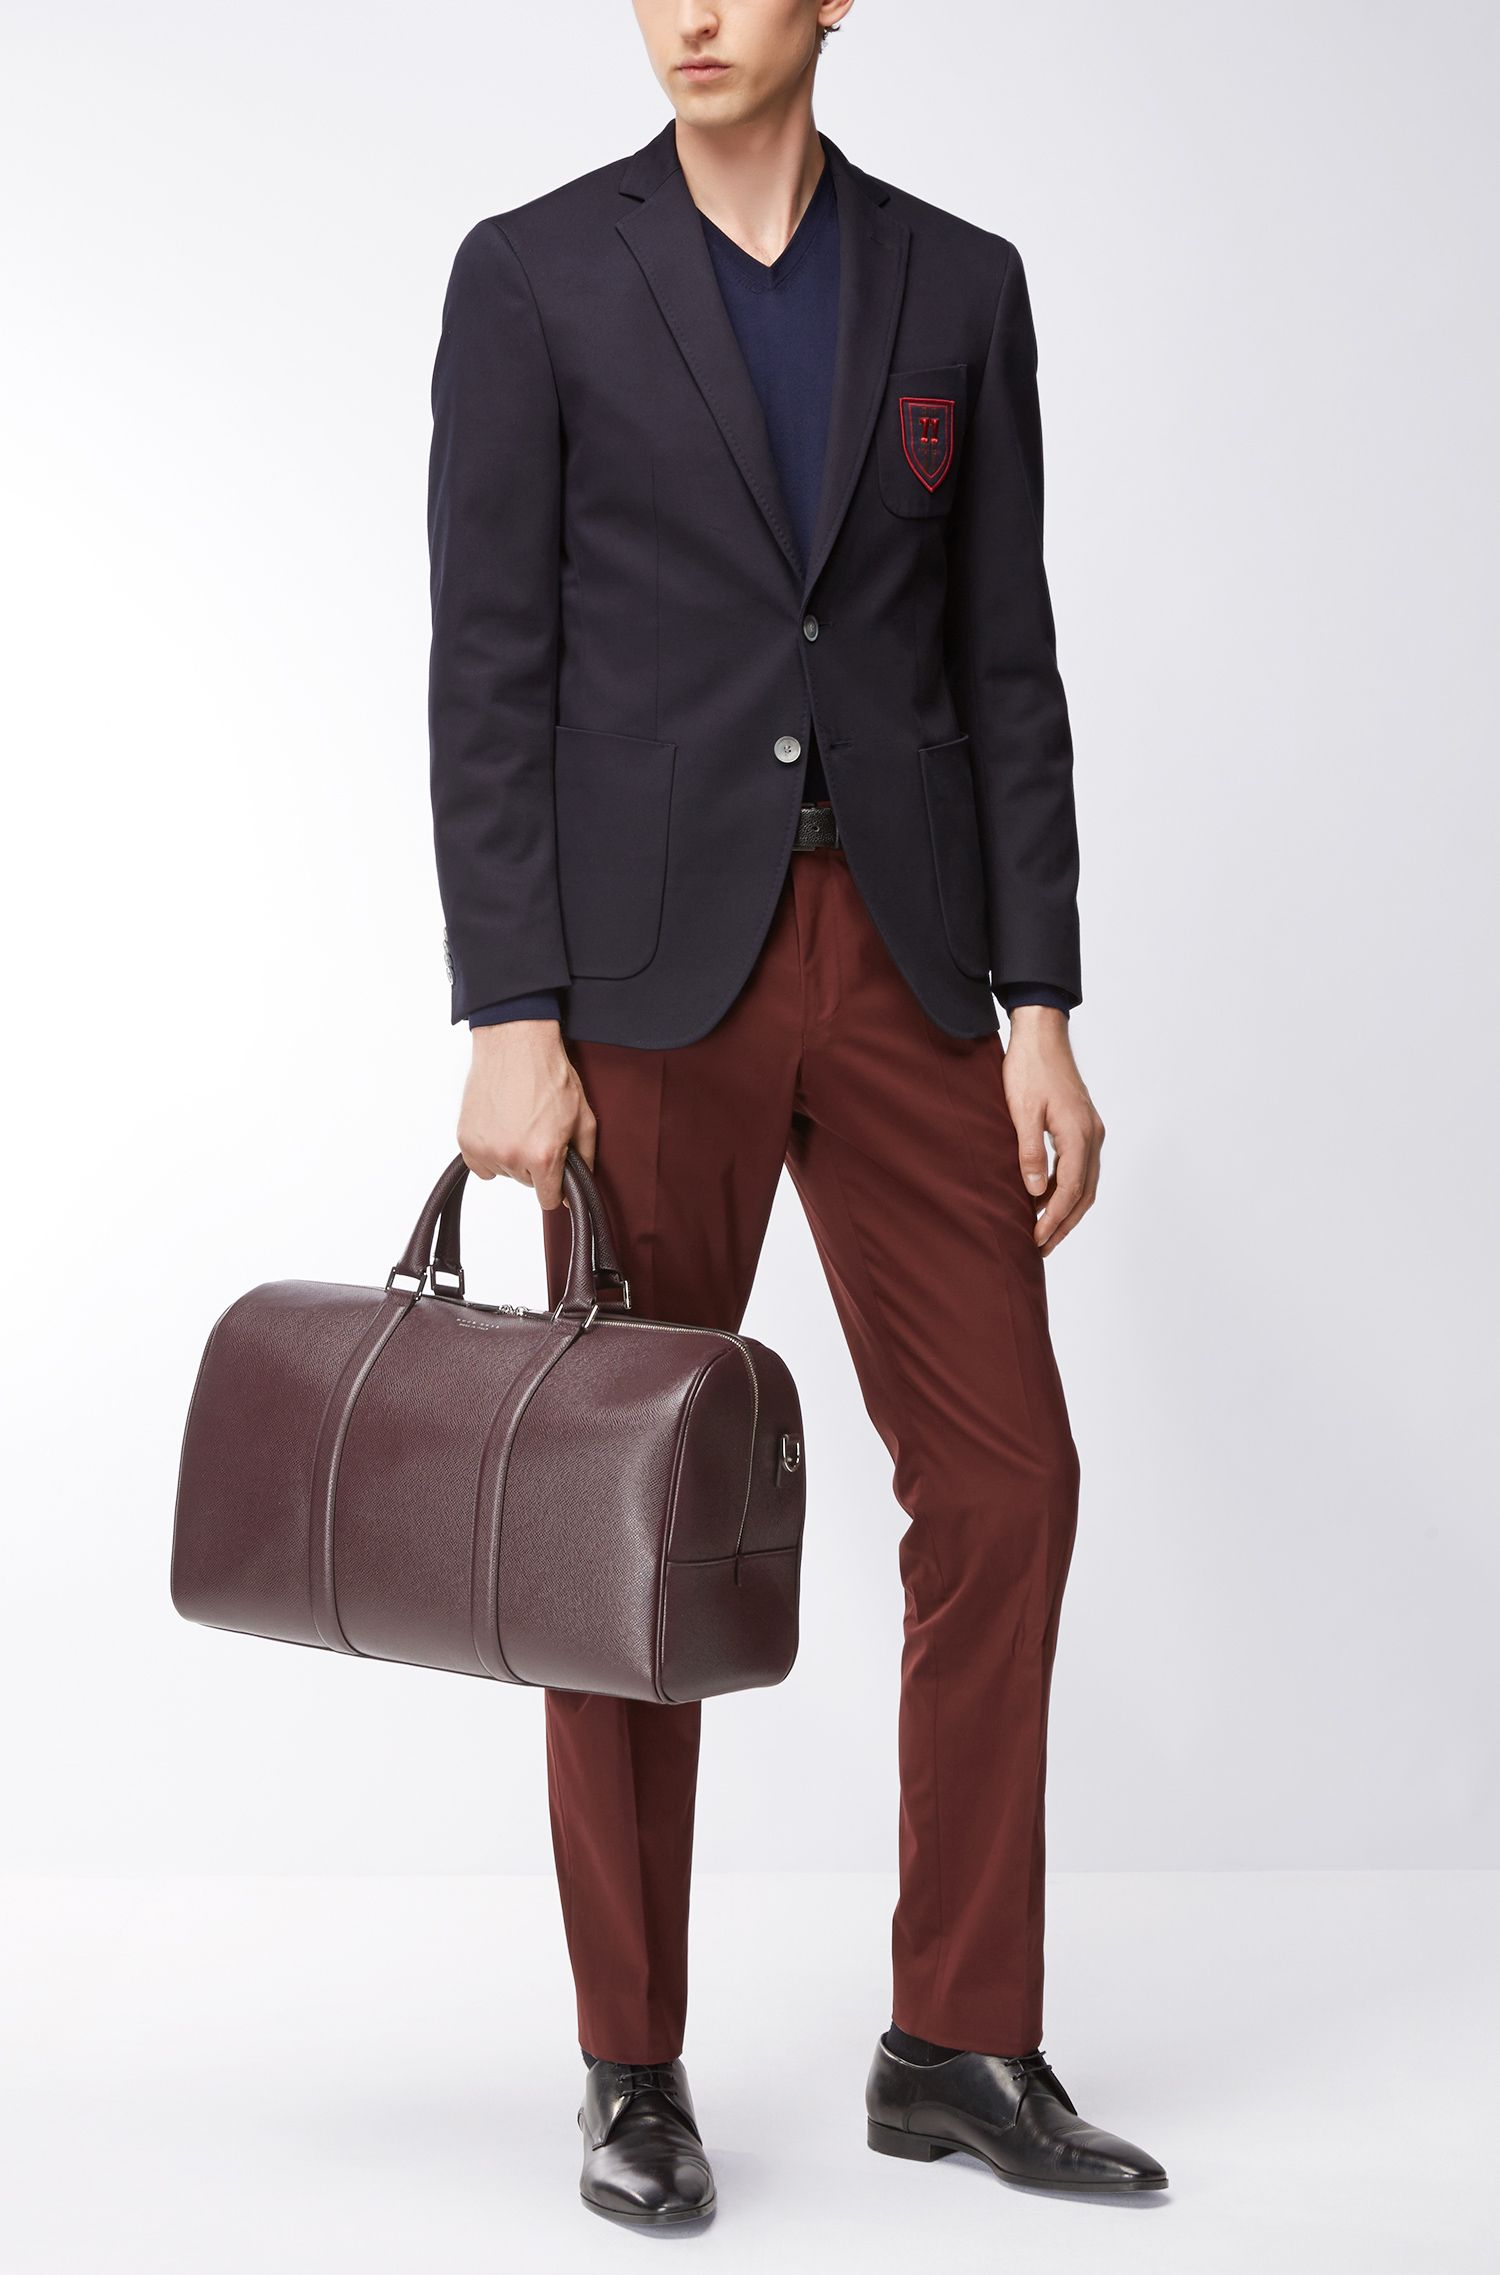 Weekender Bag | Signature Hold